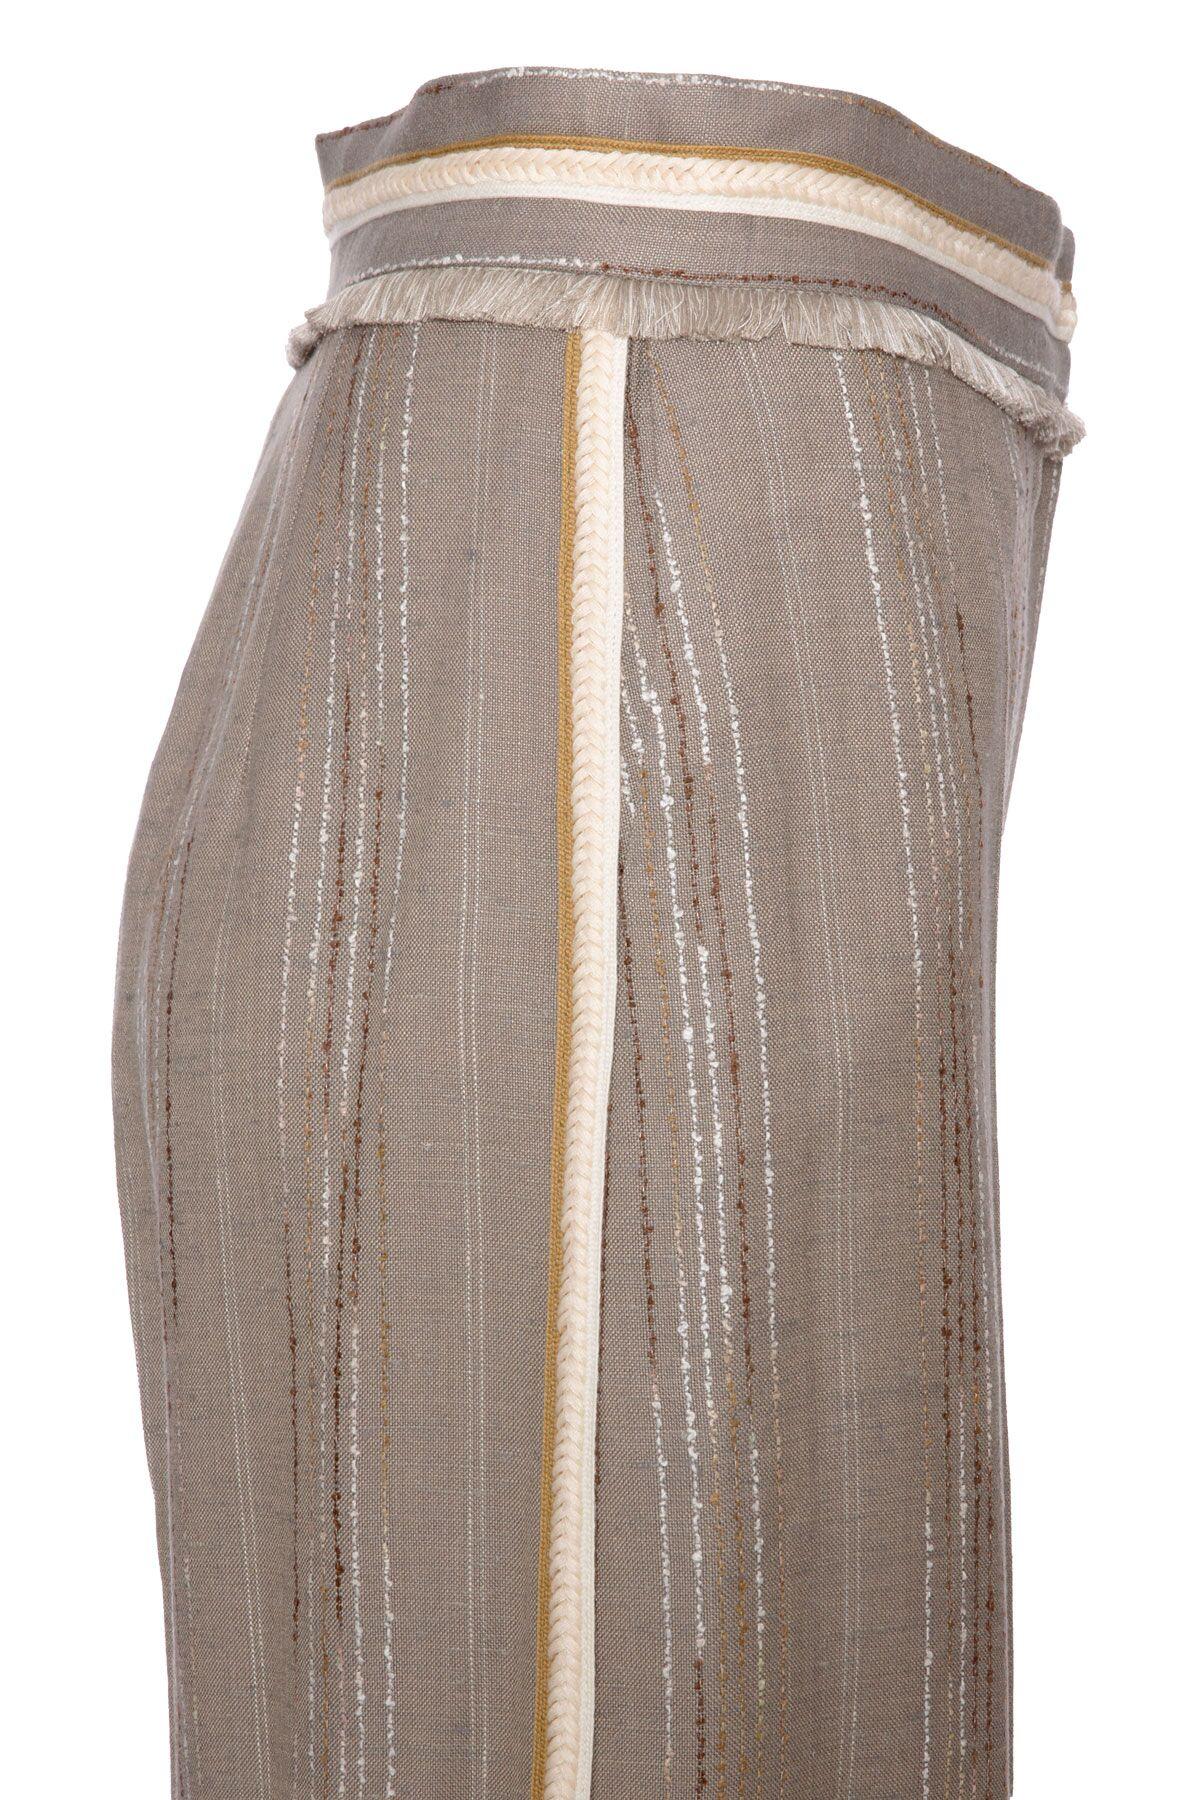 Şerit Detaylı Çizgili Geniş Paça Vizon Pantolon